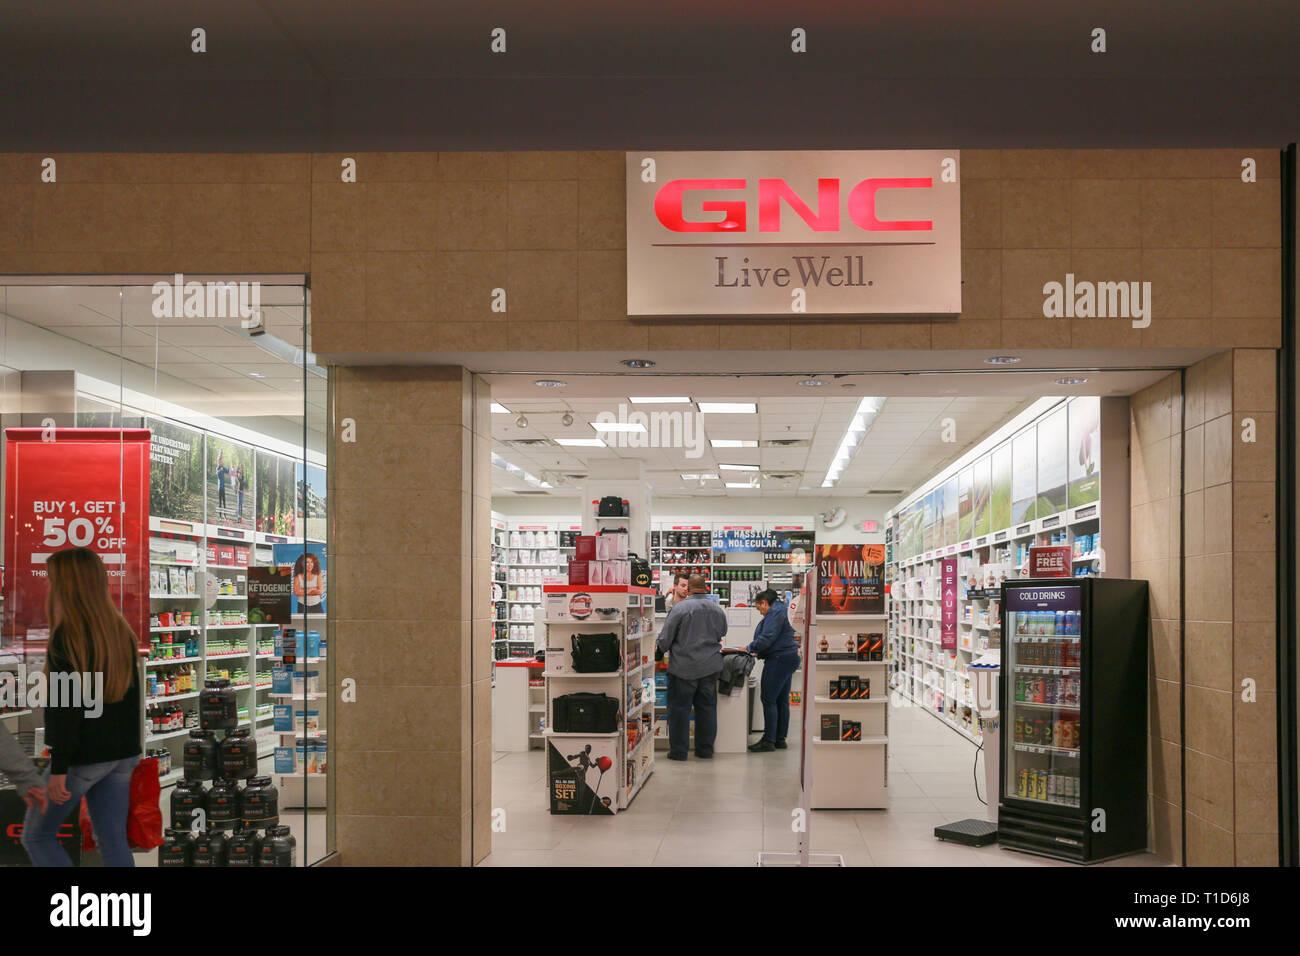 Gnc Store Storefront Stock Photos & Gnc Store Storefront